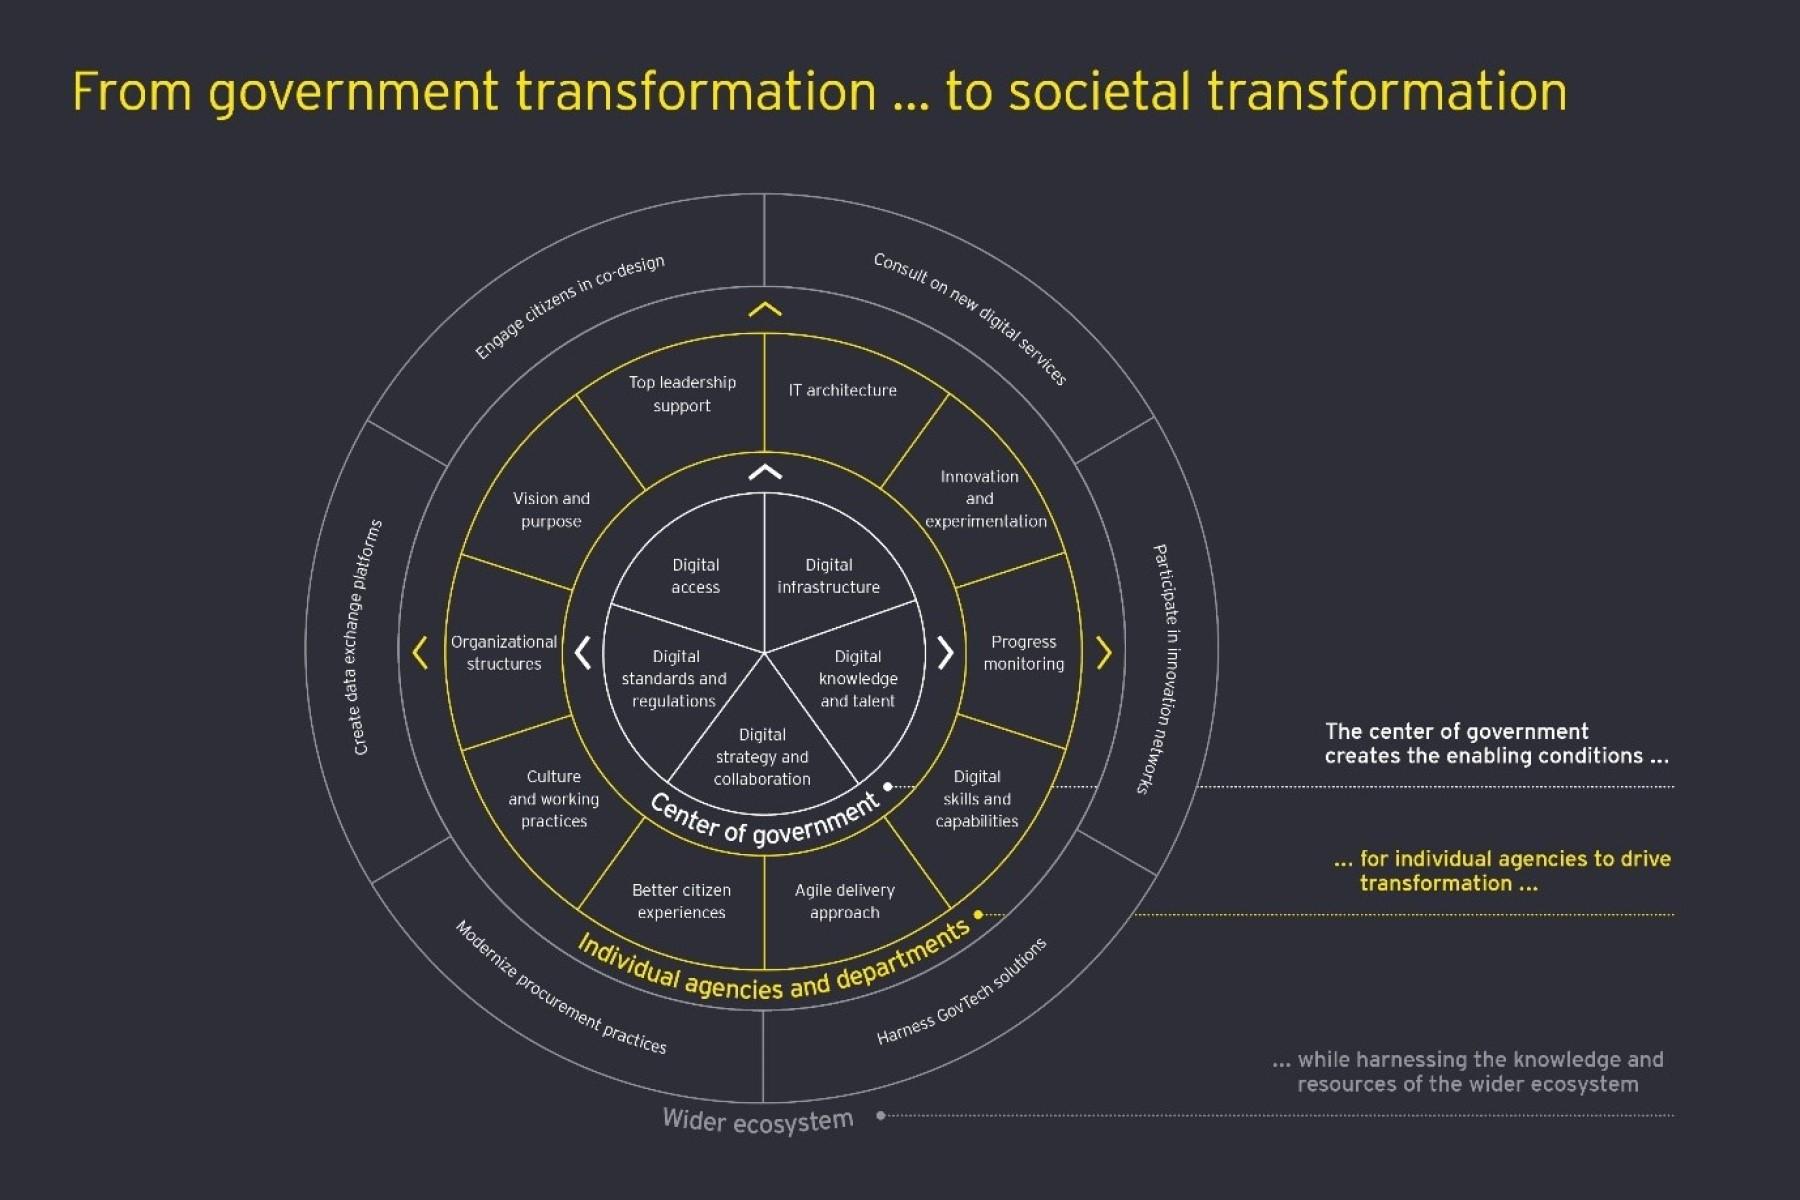 Government transformation to societal transformation